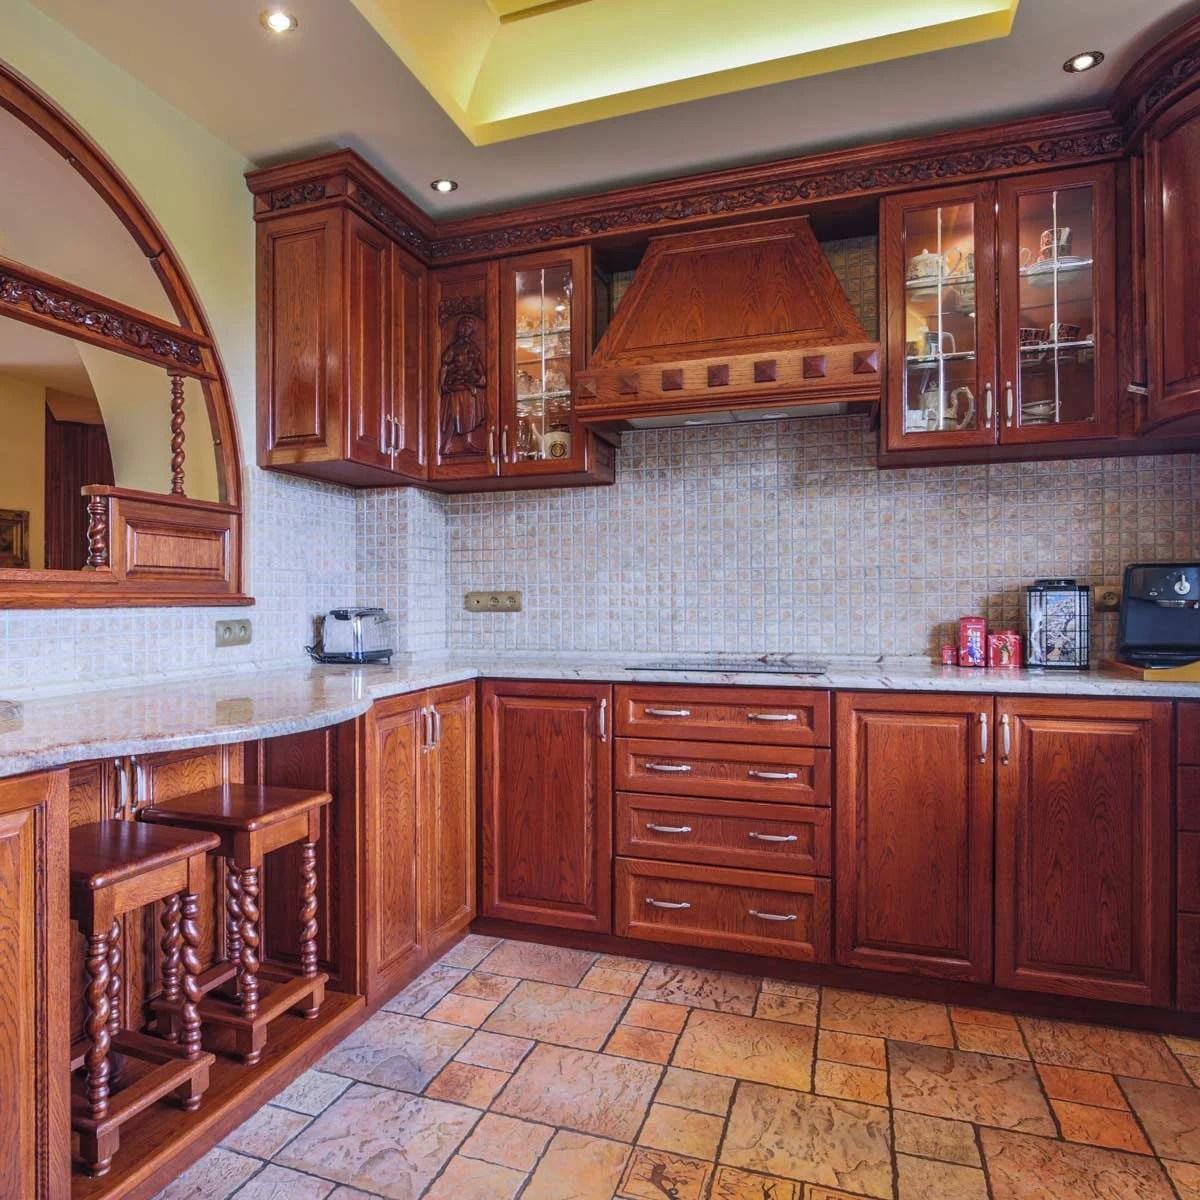 Best Kitchen Backsplash Ideas For Dark Cabinets | Family ... on Backsplash Ideas For Dark Cabinets And Light Countertops  id=63218